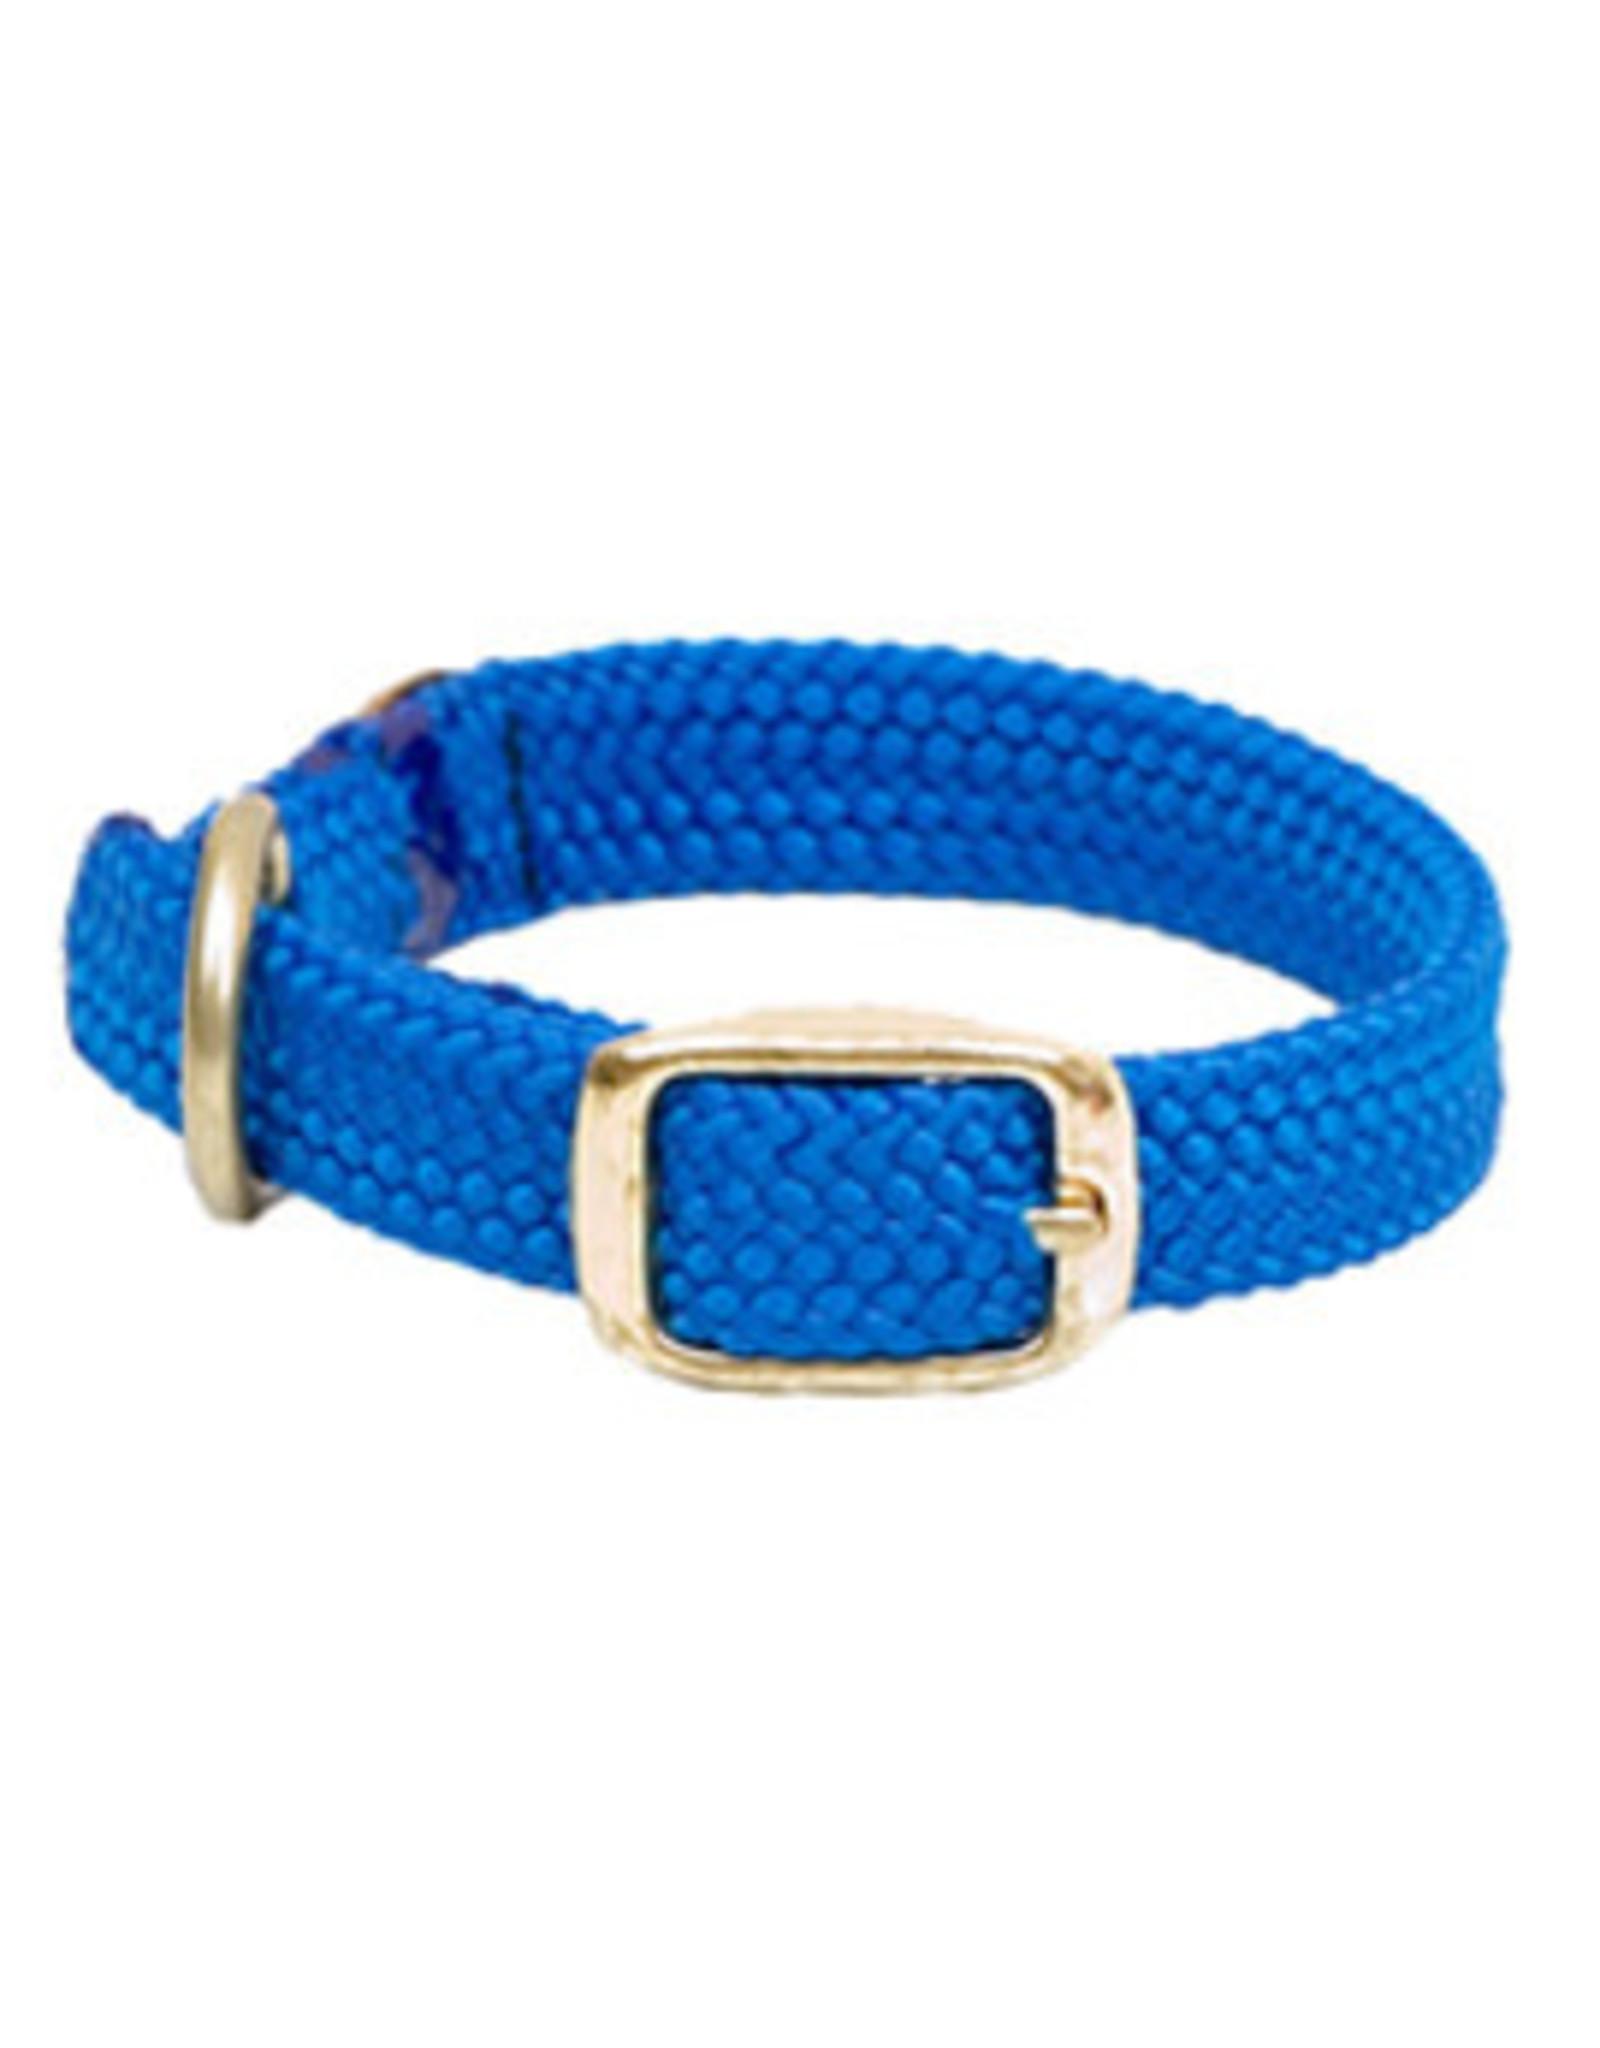 "Mendota Mendota Double-Braid Jr. Collar BLUE 9/16"" x14"""